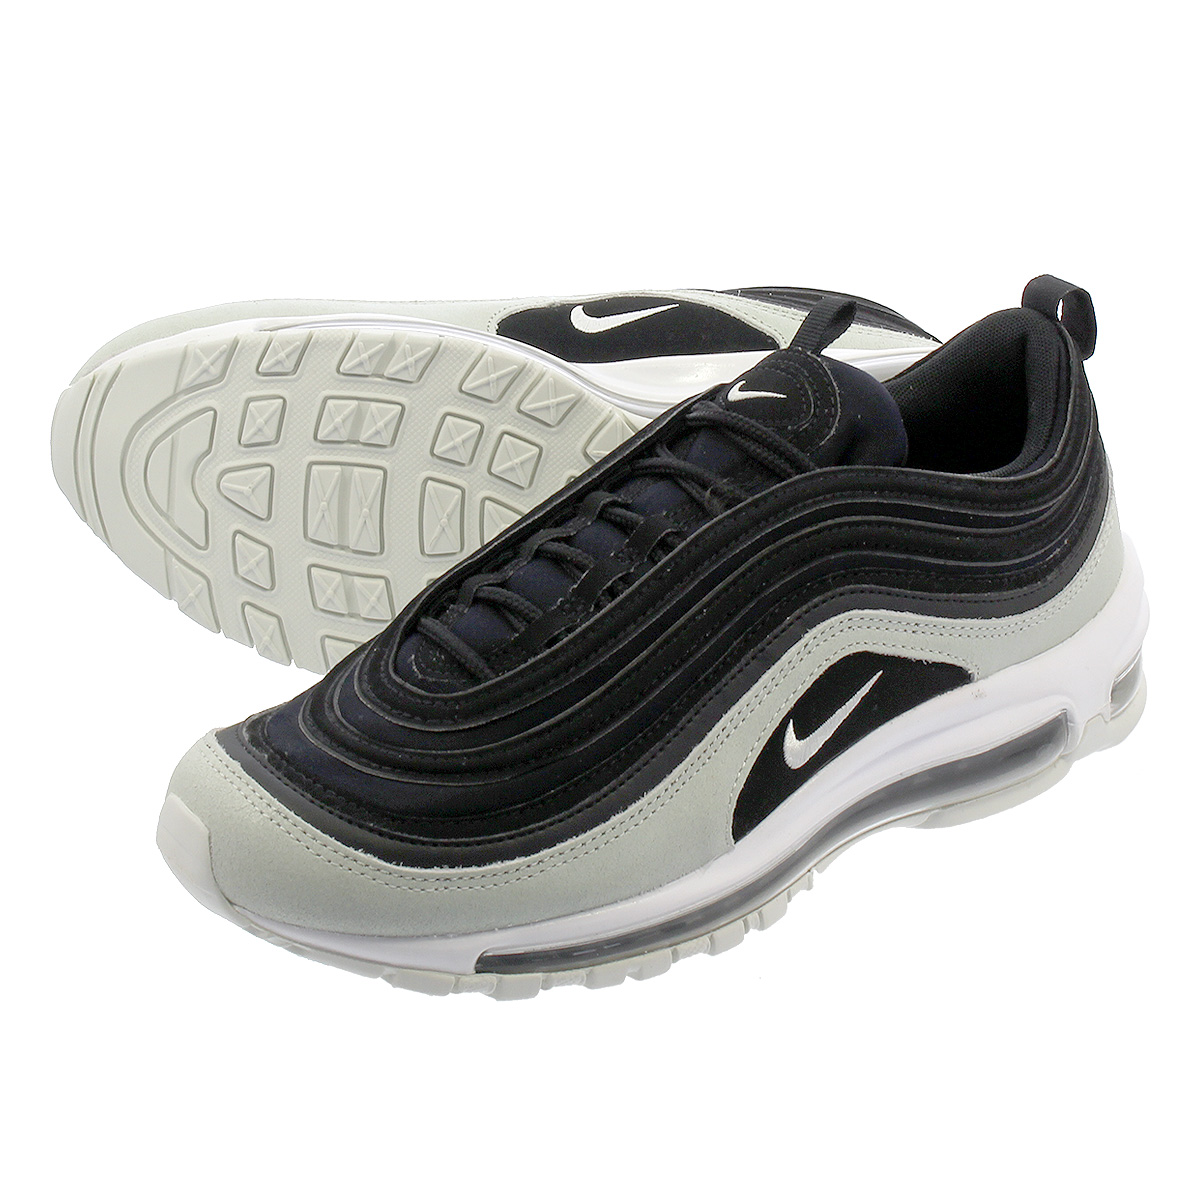 buy popular 461a1 dbc2a NIKE WMNS AIR MAX 97 PREMIUM Nike women Air Max 97 premium BLACK SPRUCE AURA  BLACK SPRUCE AURA 917,646-007